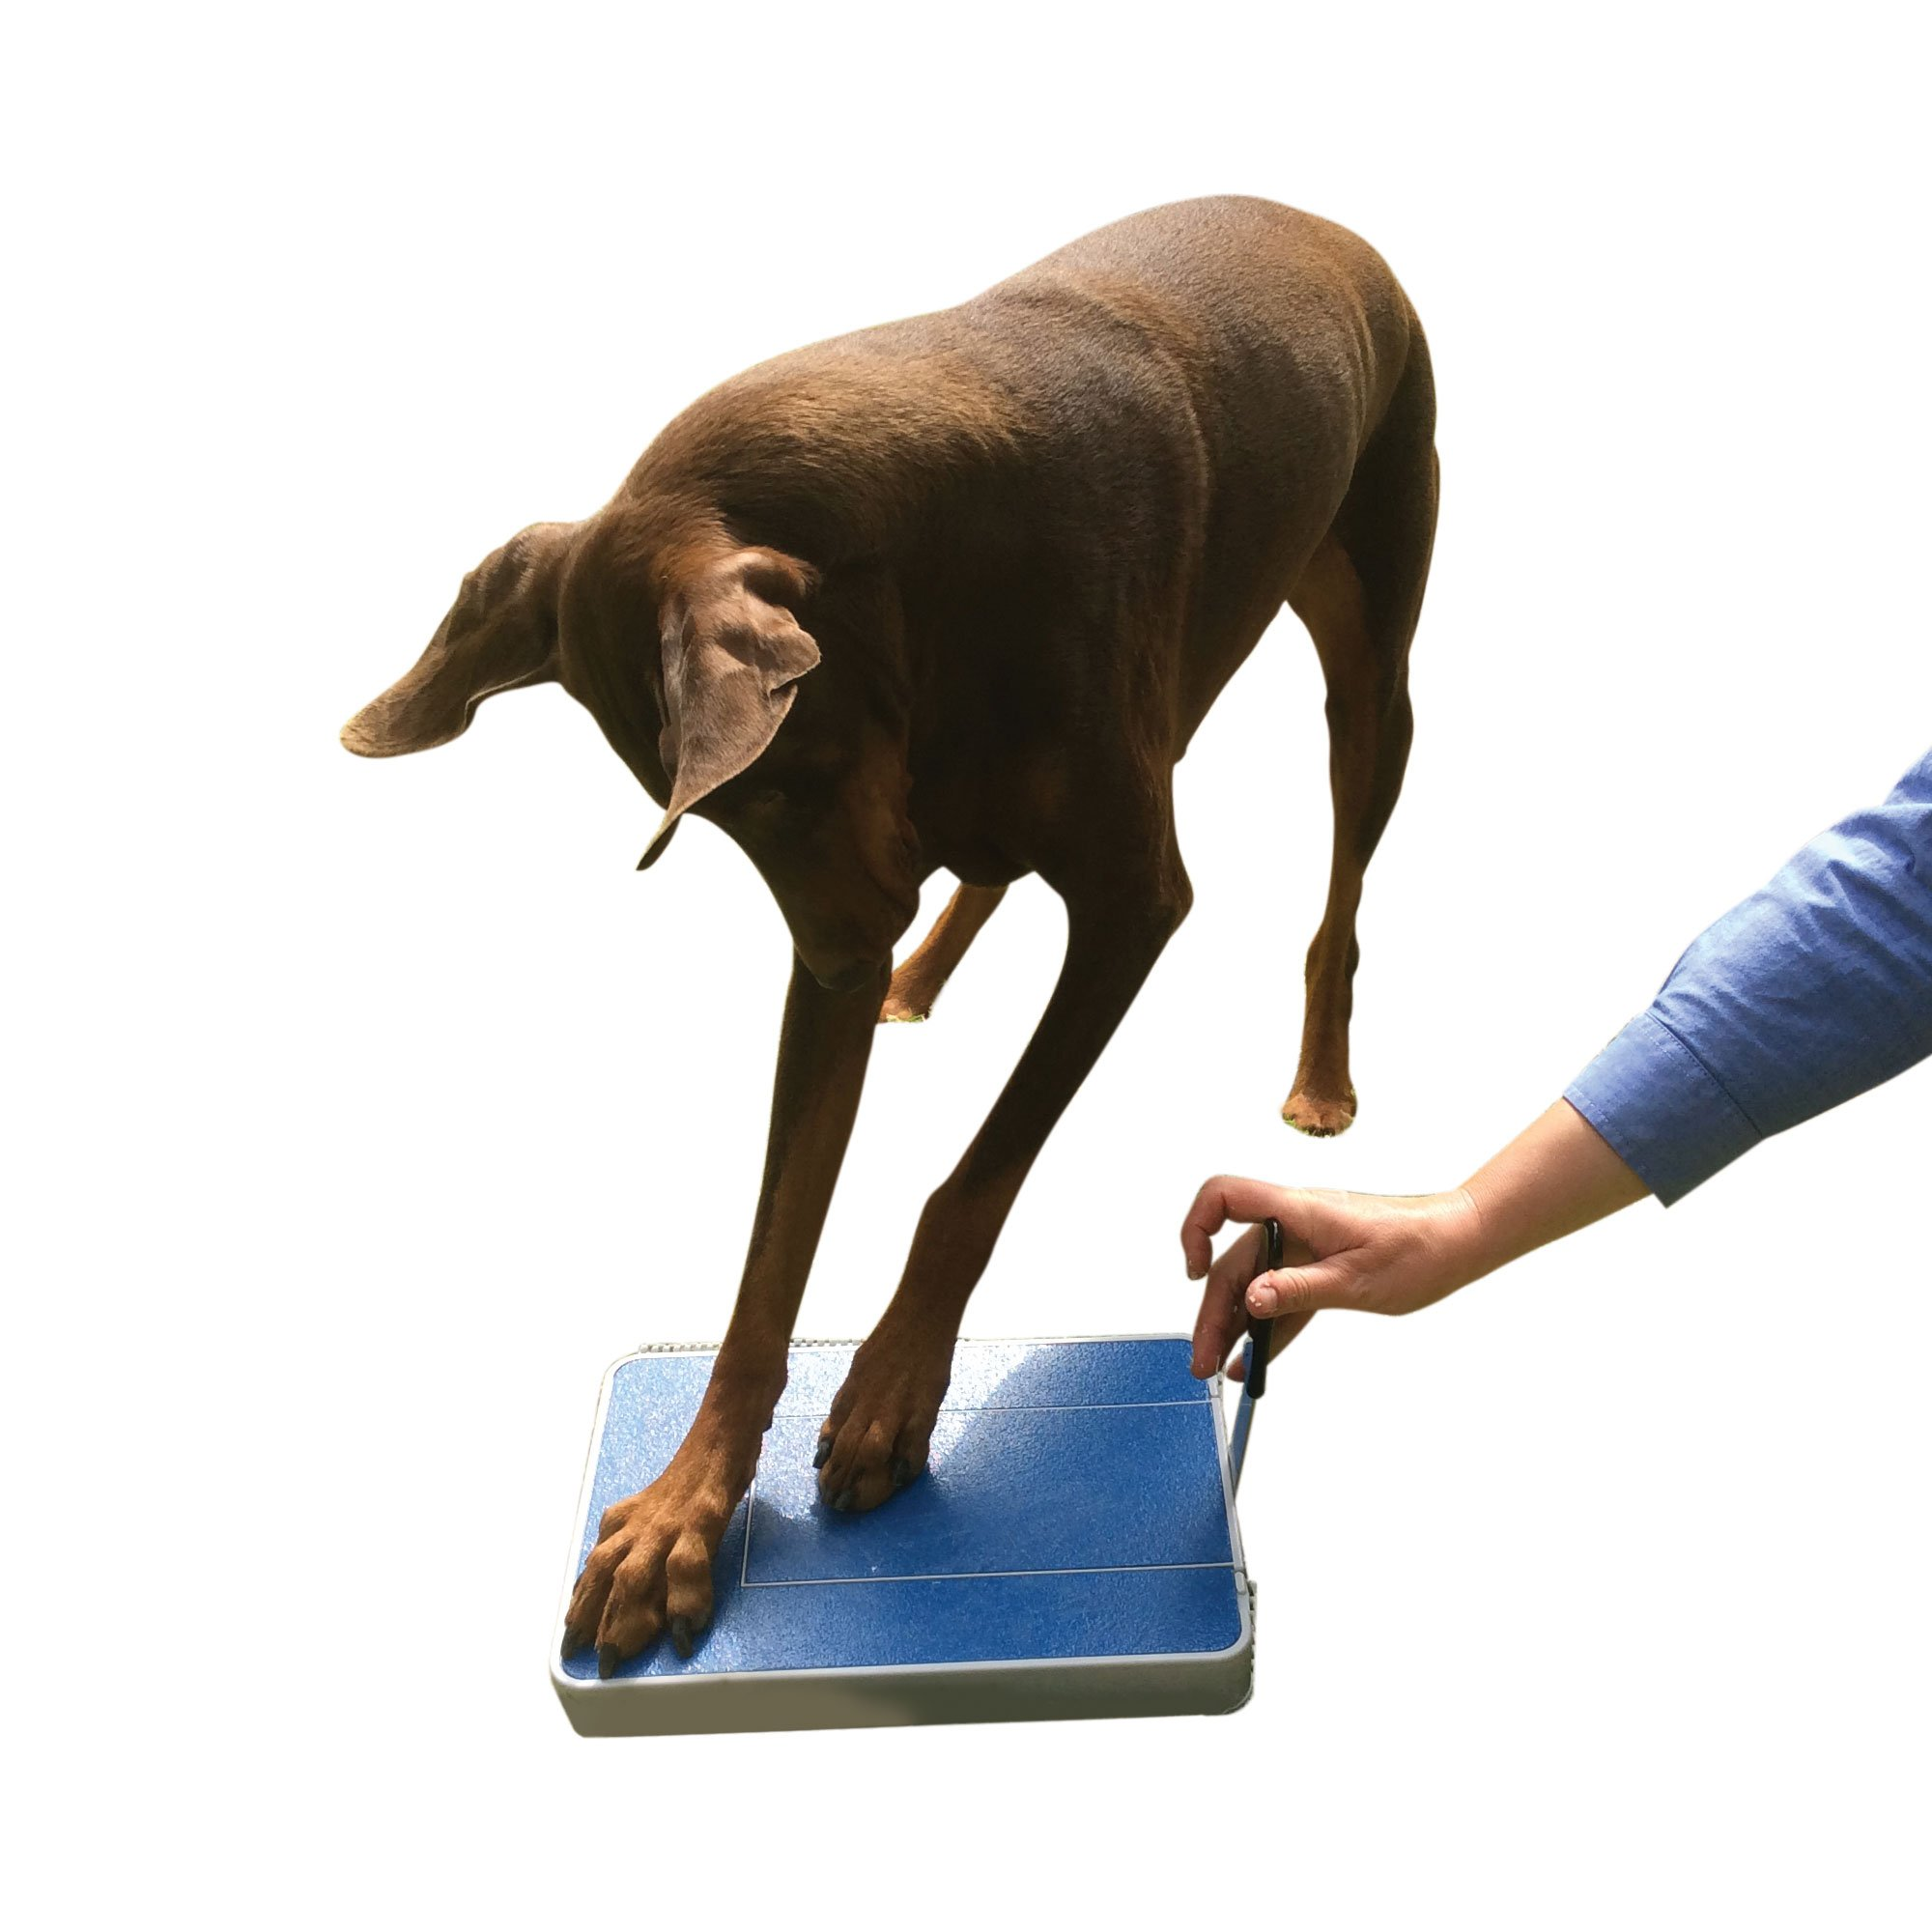 Digger Dog Nail File Stress Free Alternative to Dog Nail Clippers and Dog Nail Grinders (Blue Model 2018)